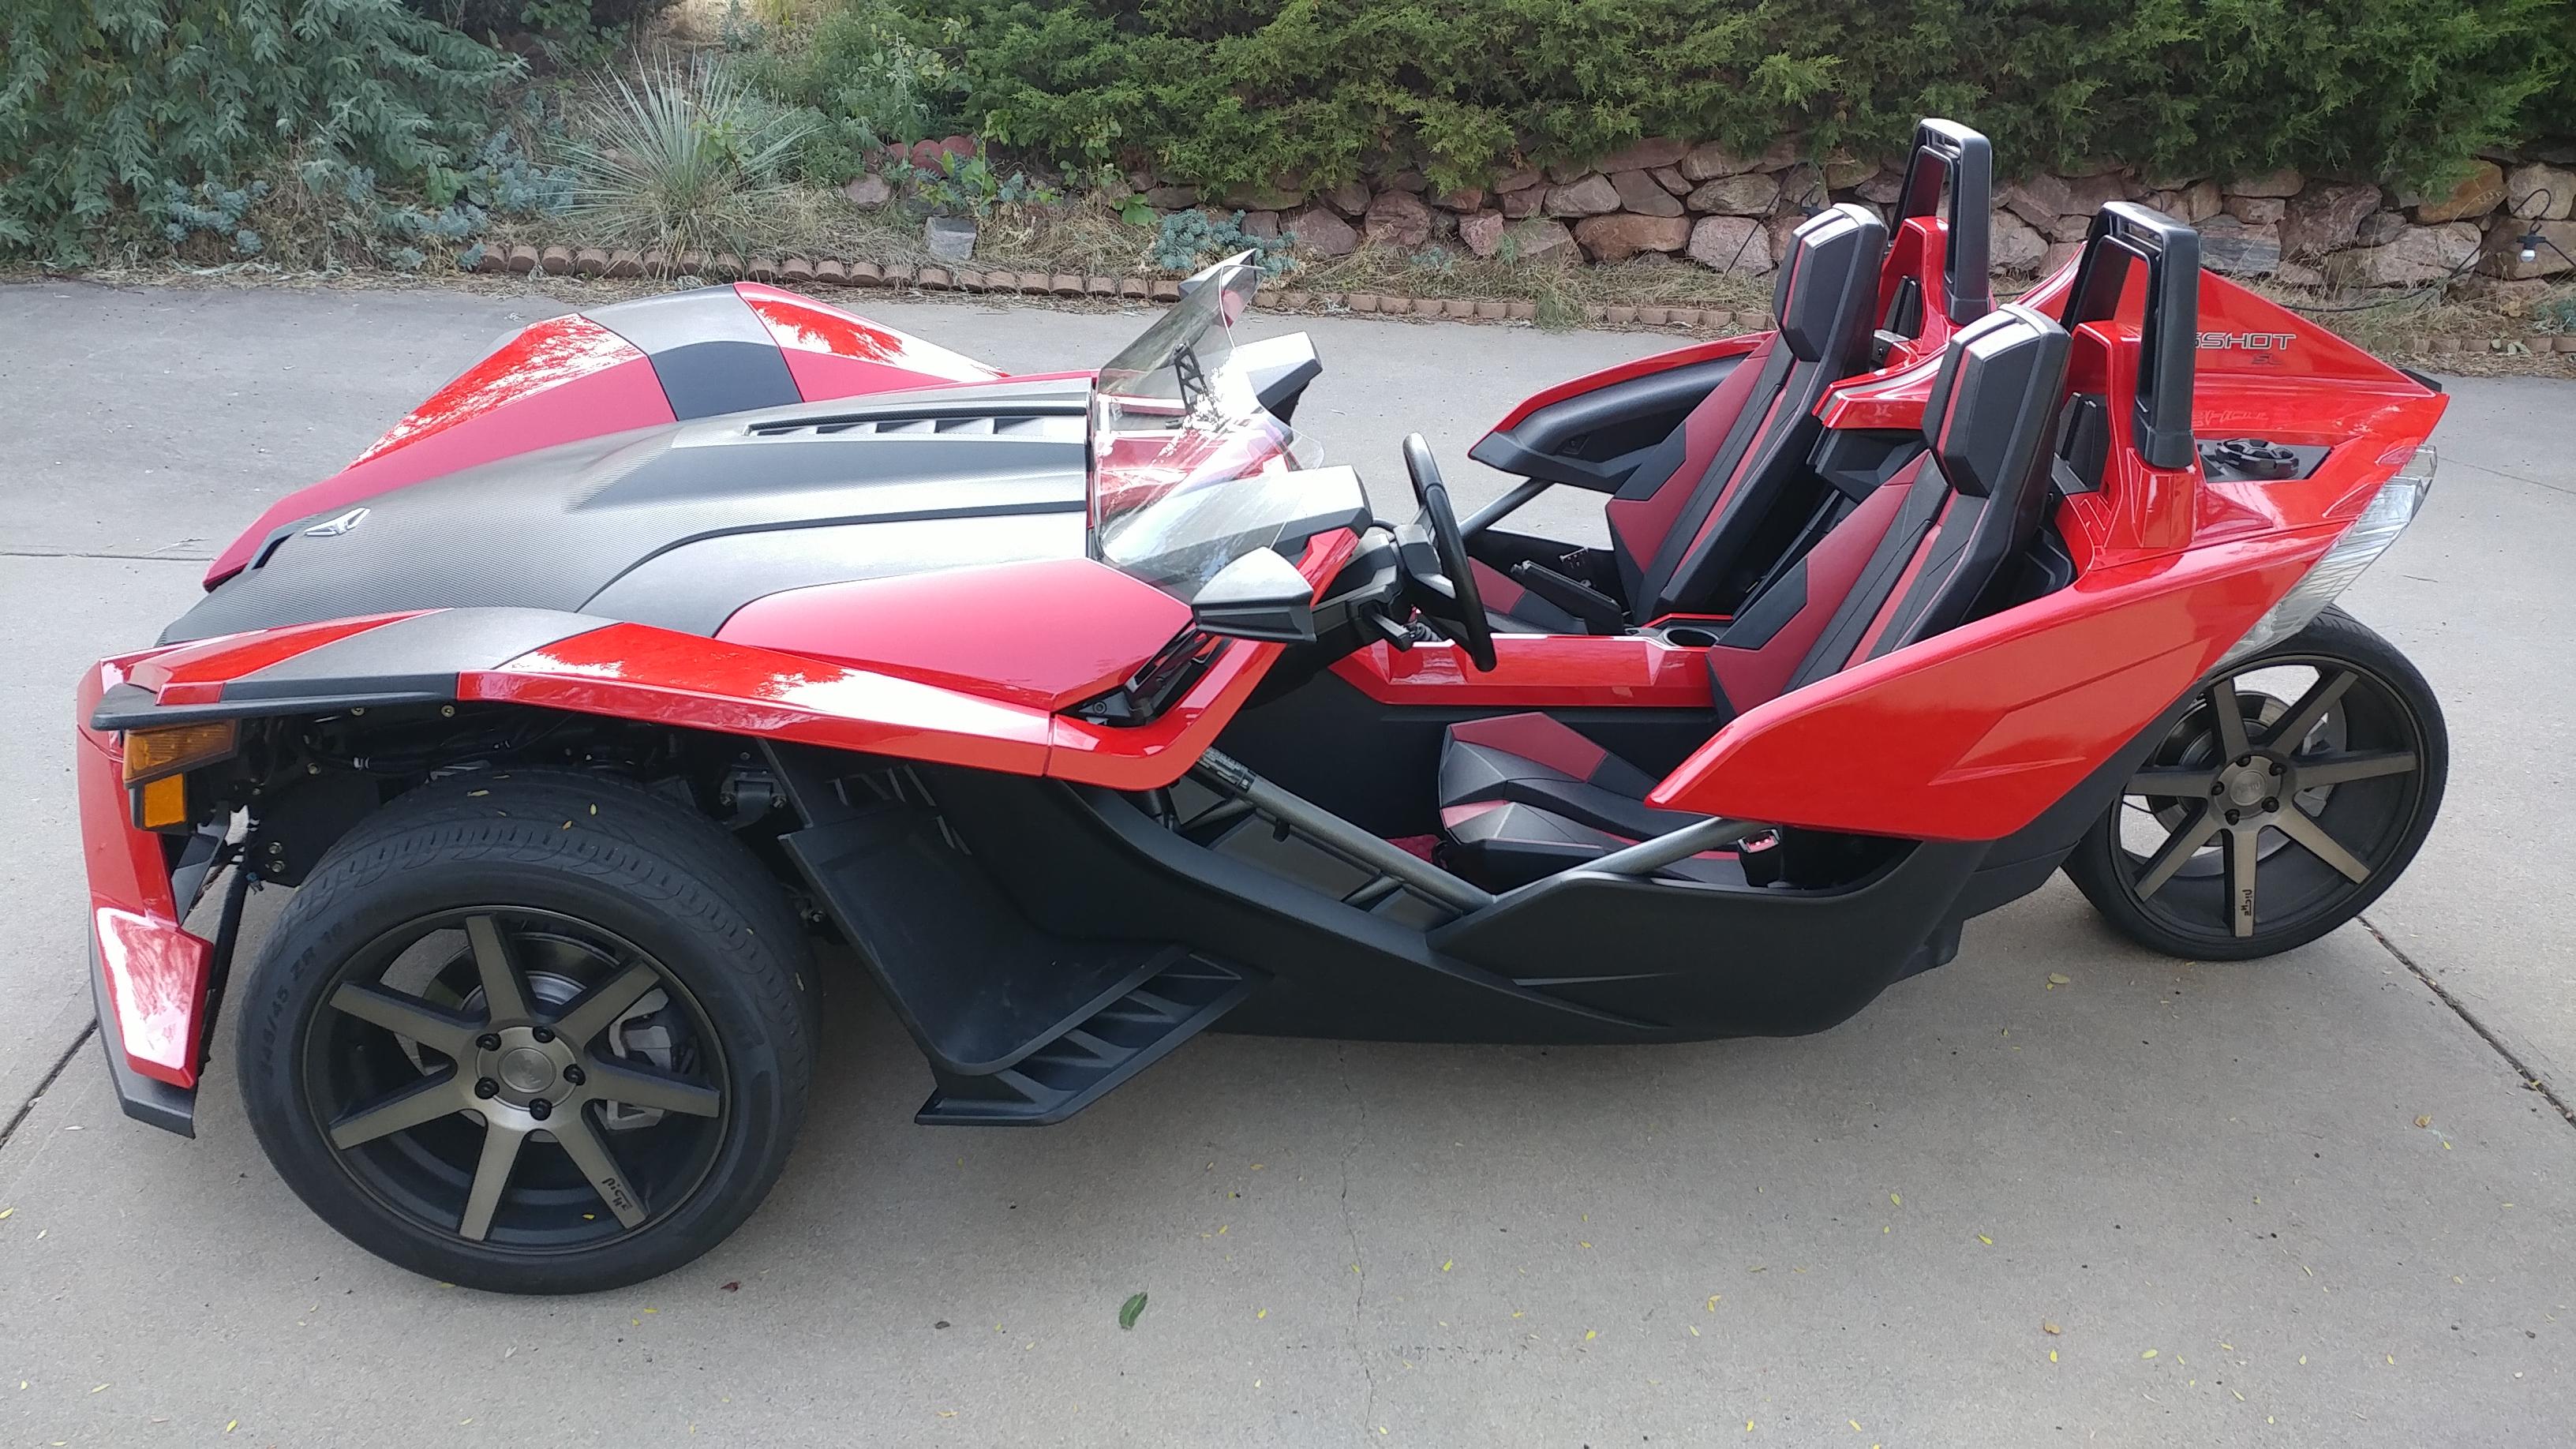 For Sale - 2015 Slingshot SL Turbo | Polaris Slingshot Forum